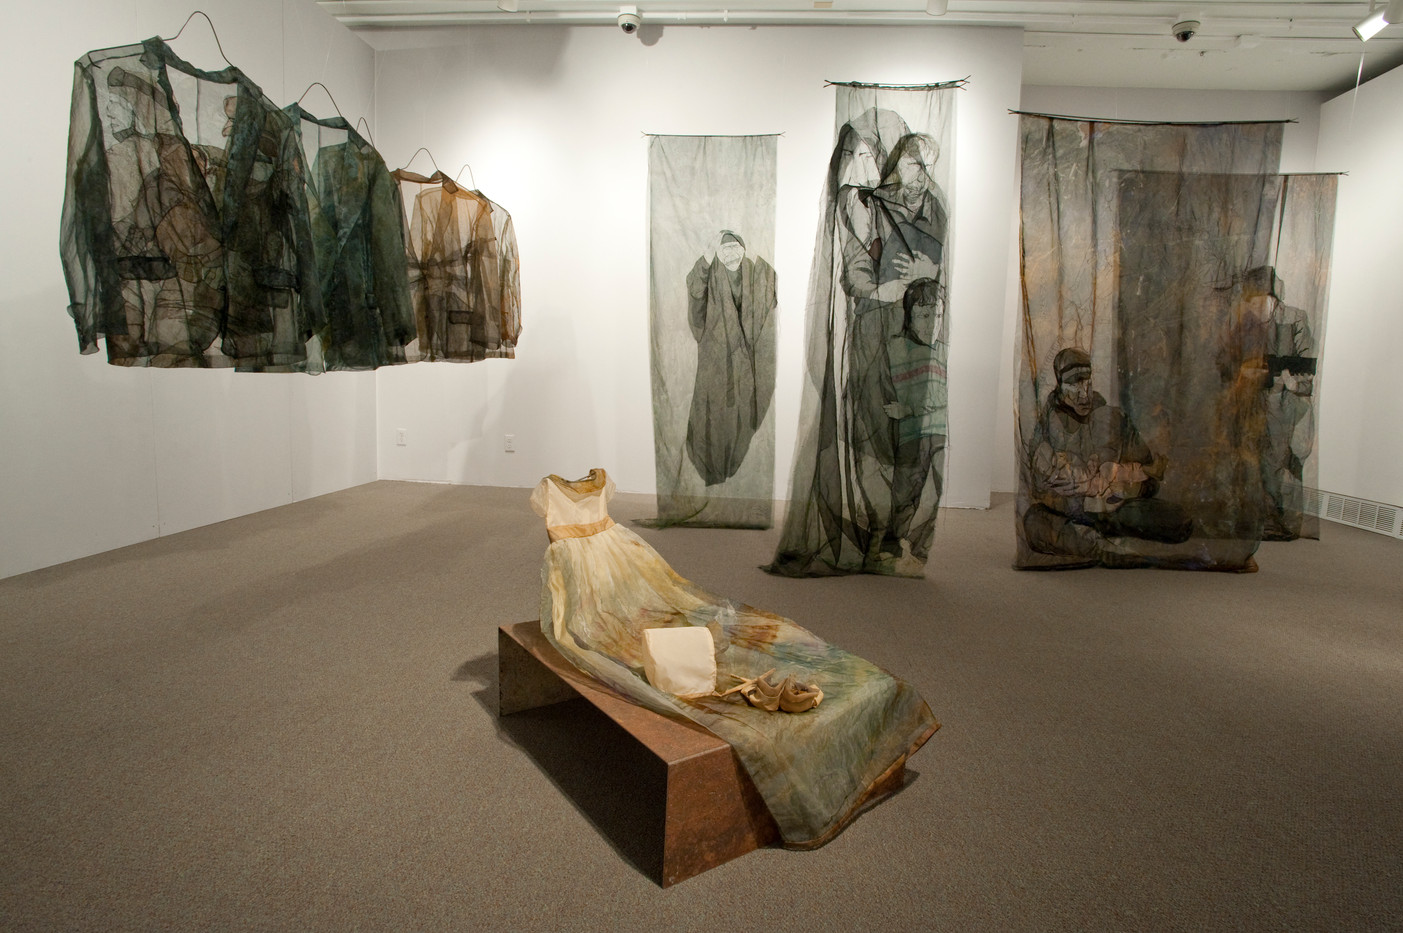 Thesis exhibition